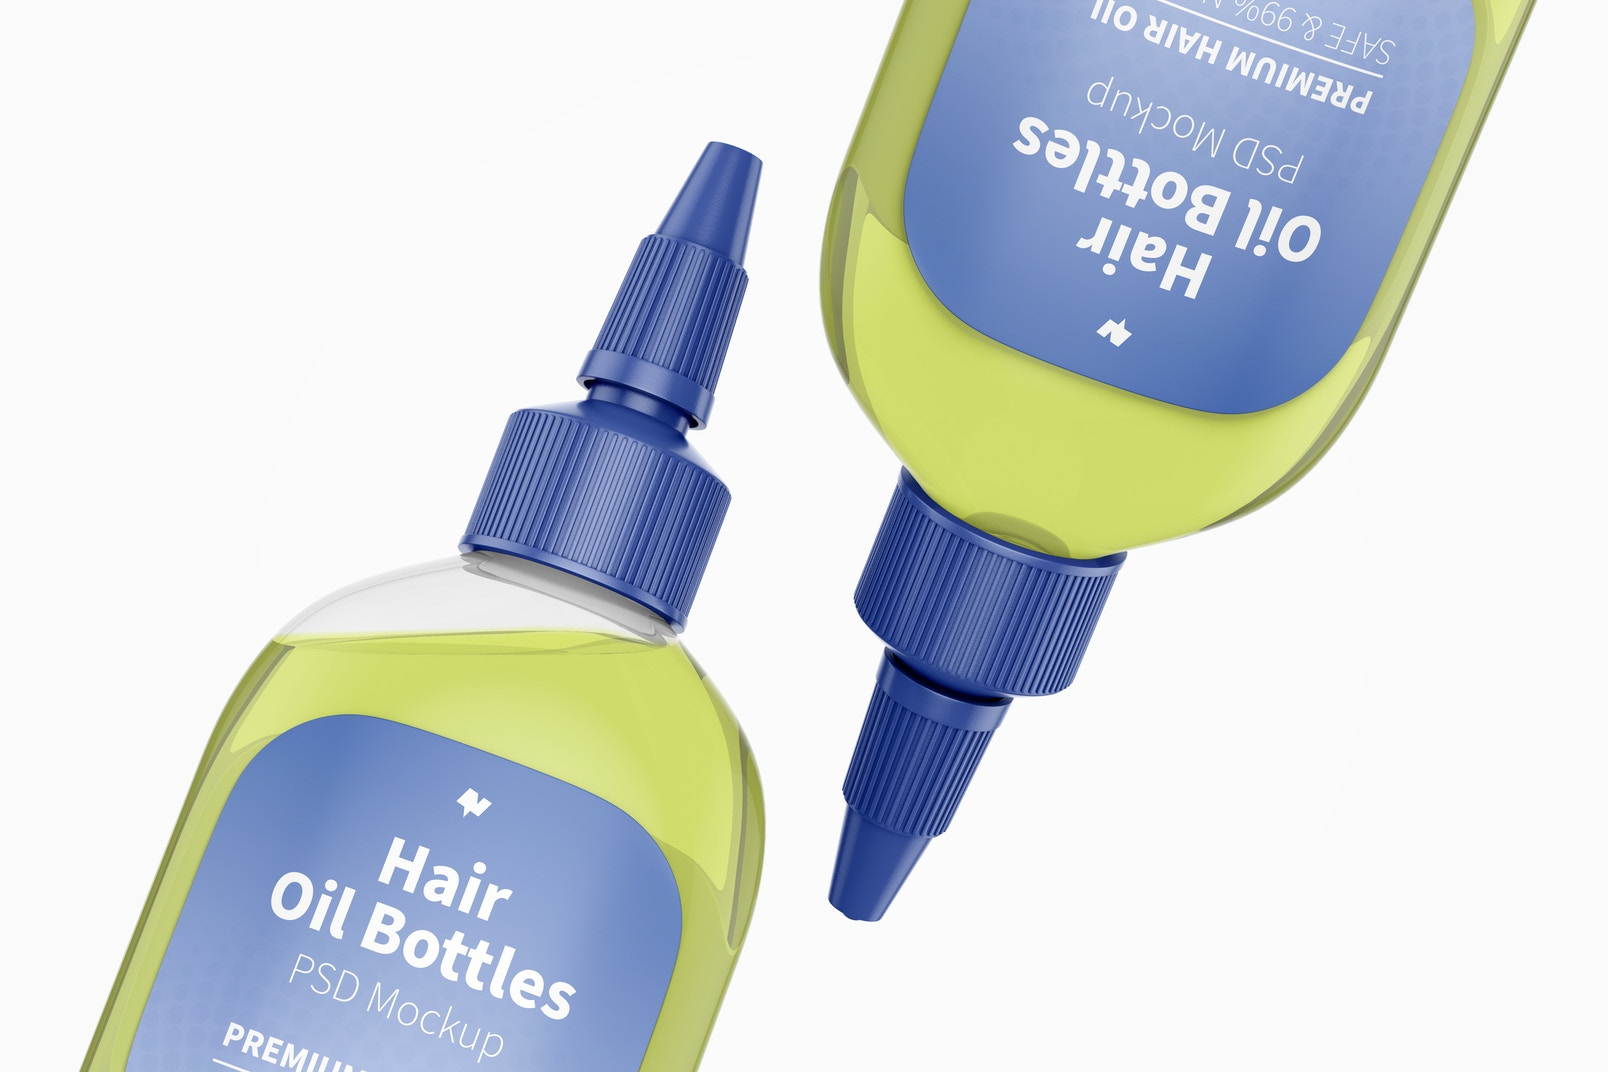 Hair Oil Bottles Mockup, Close Up